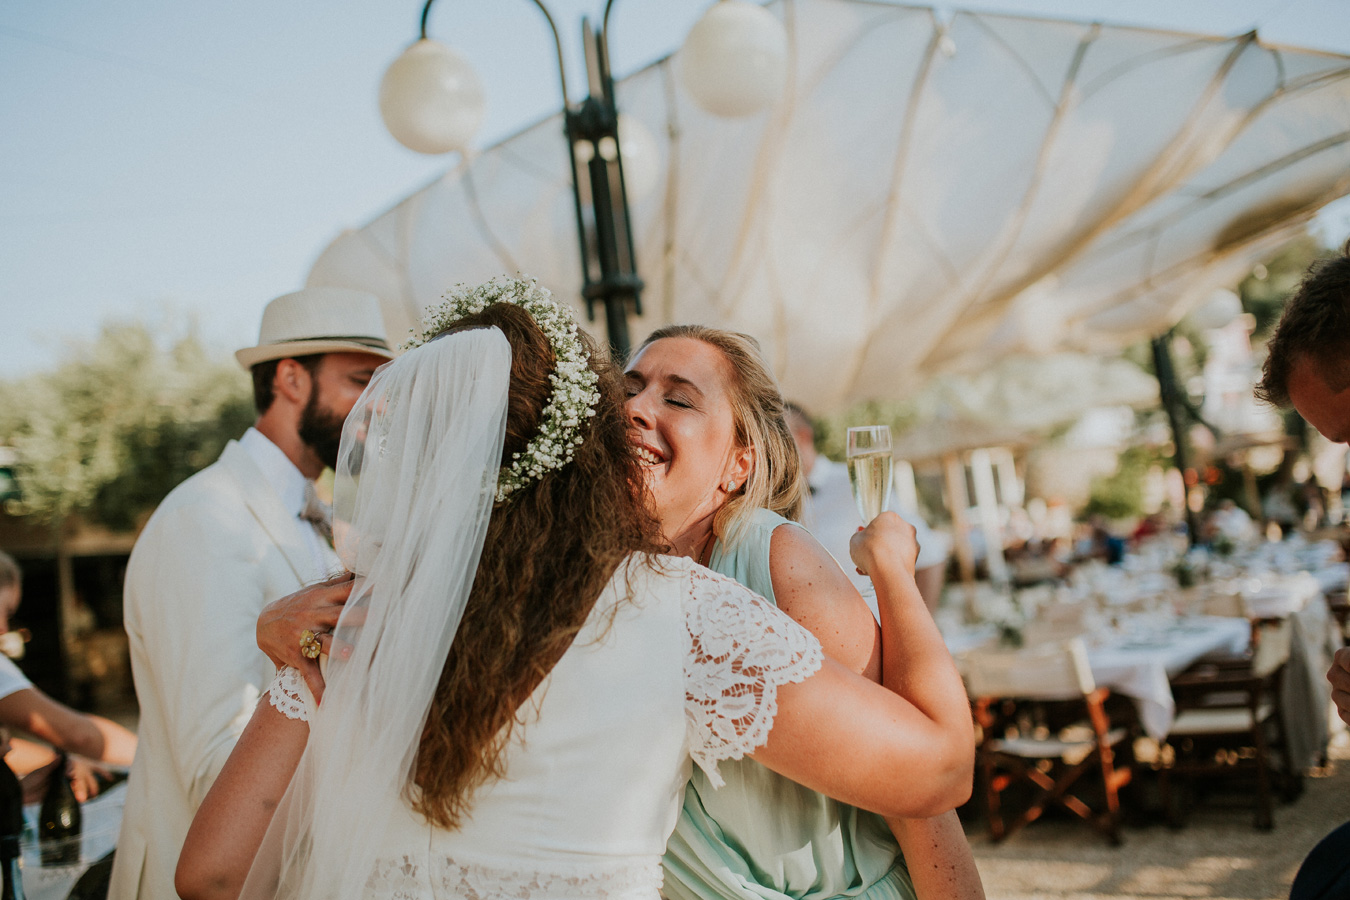 066-bryllupsfotograf-oslo-destinasjonsbryllup-fotograf-tone-tvedt.jpg